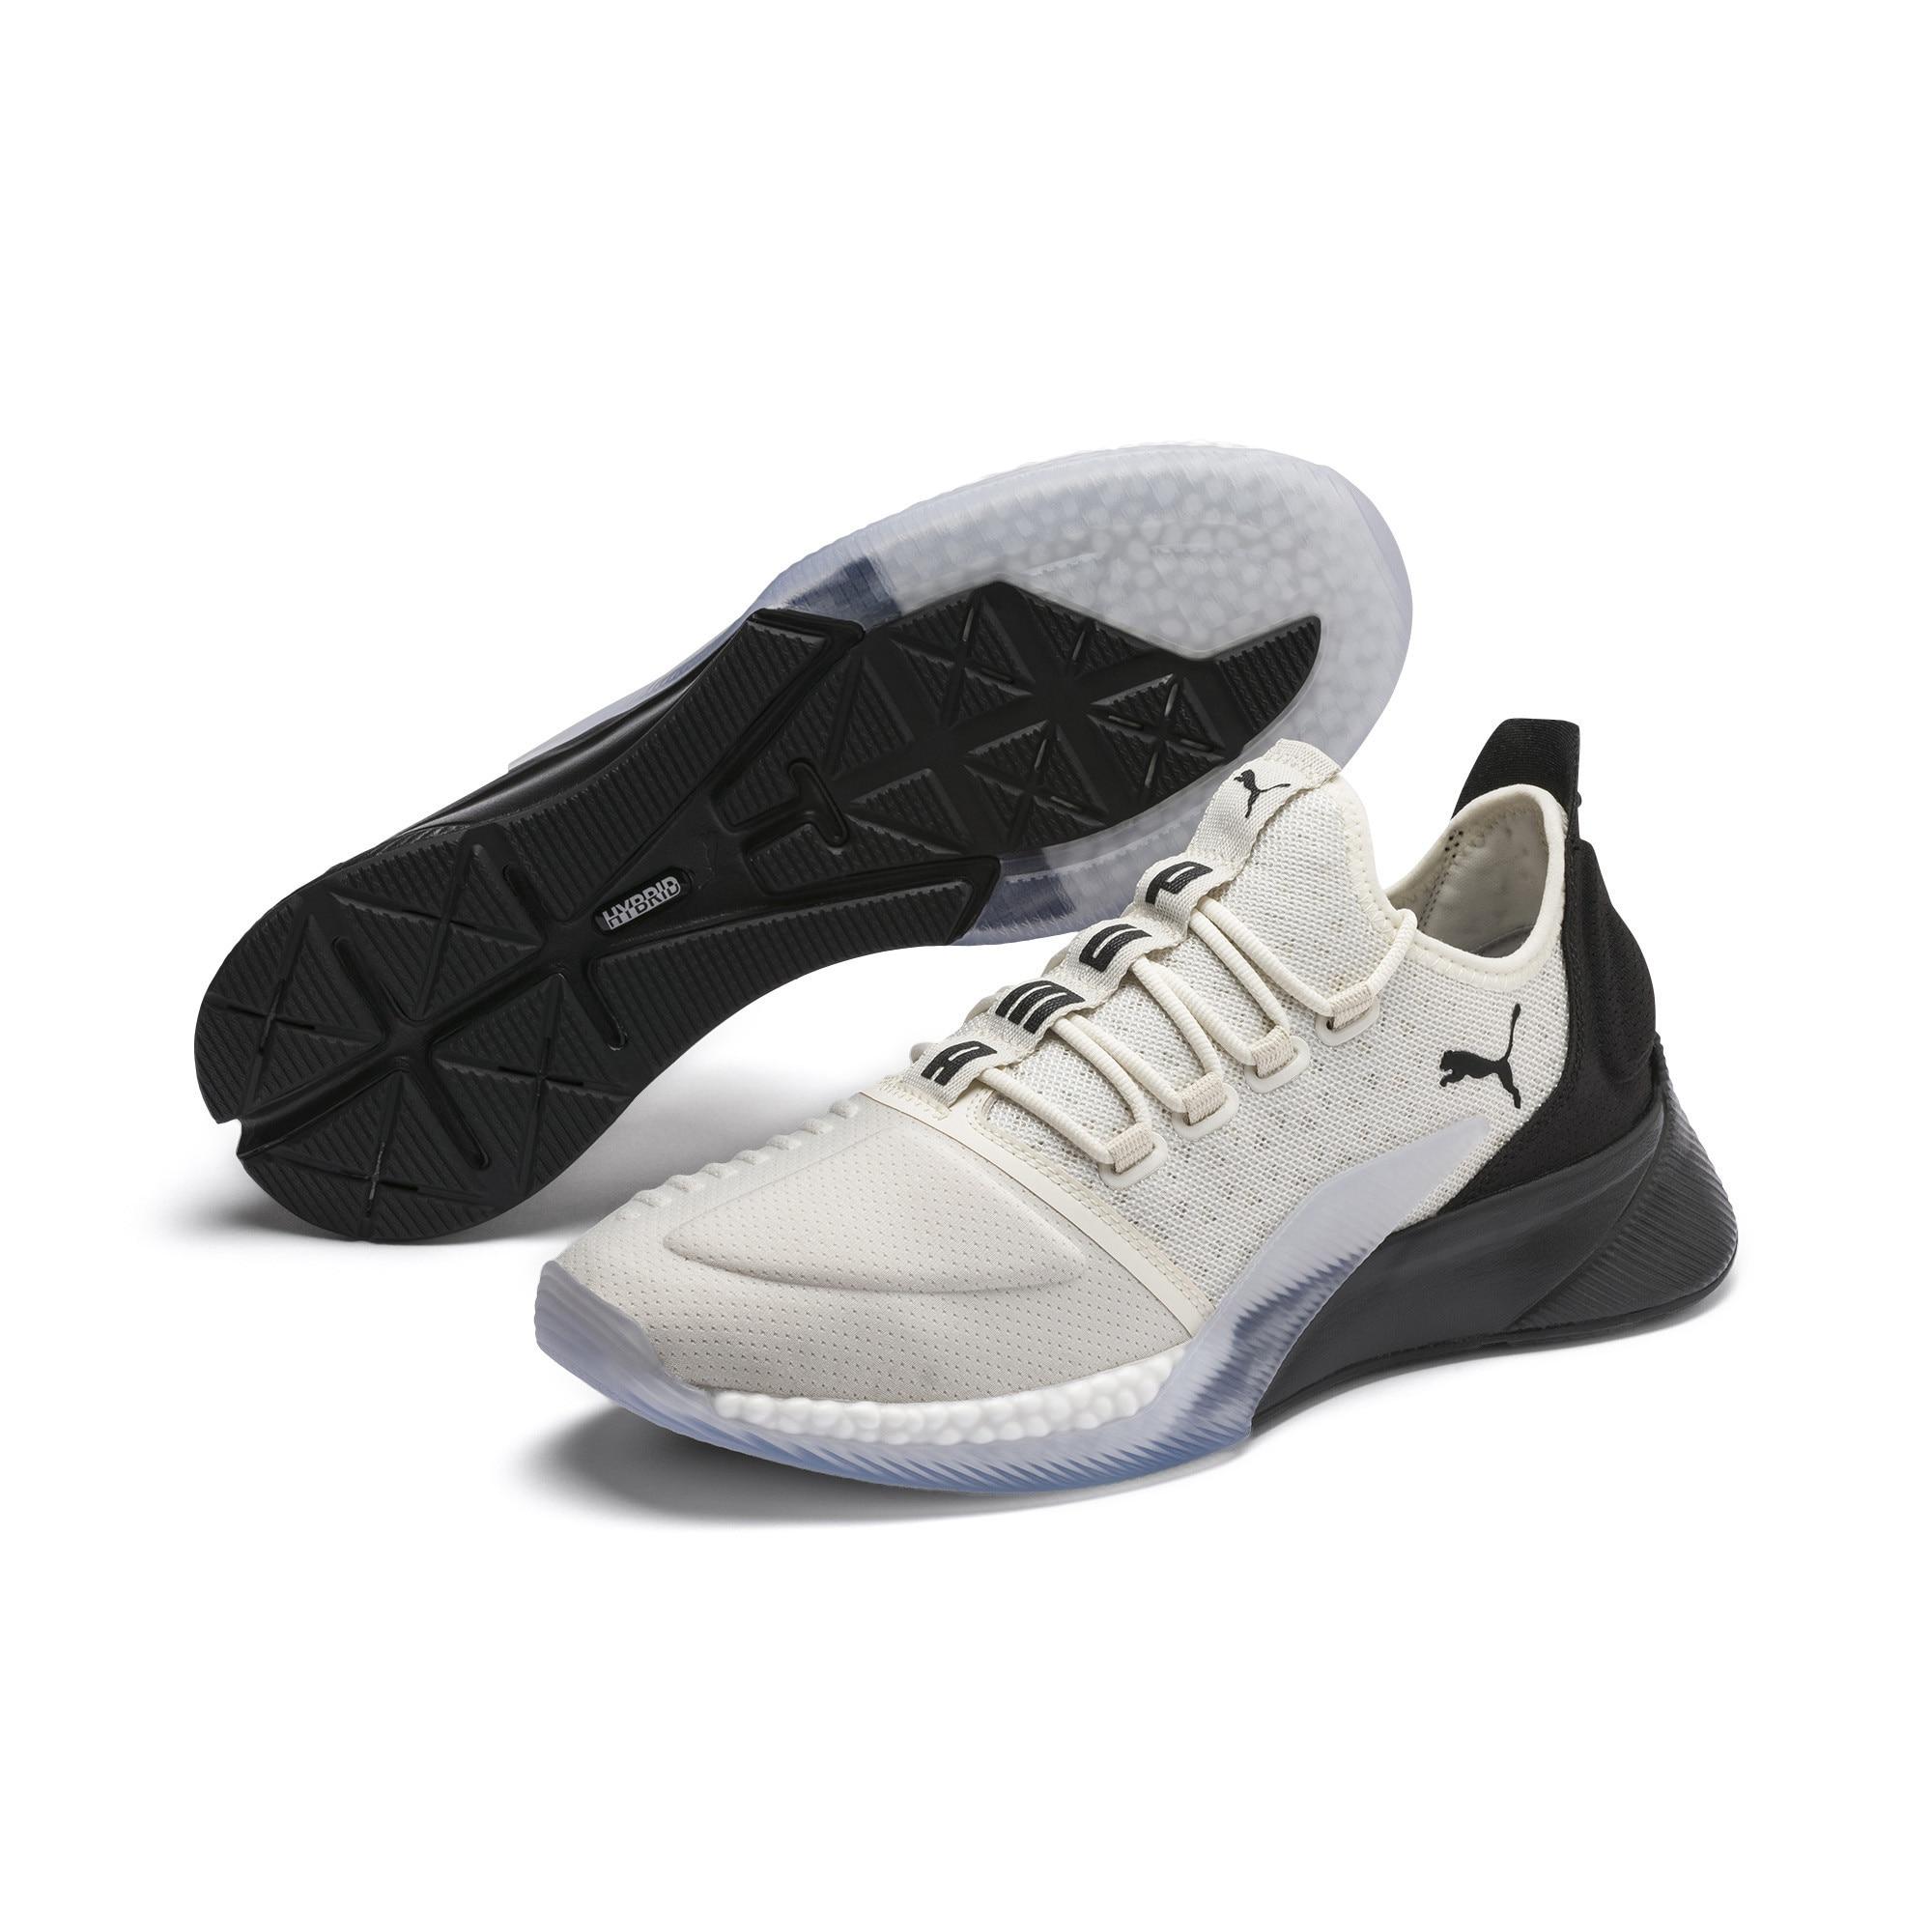 Laufschuhe 'Xcelerator' | Schuhe > Sportschuhe > Laufschuhe | Puma